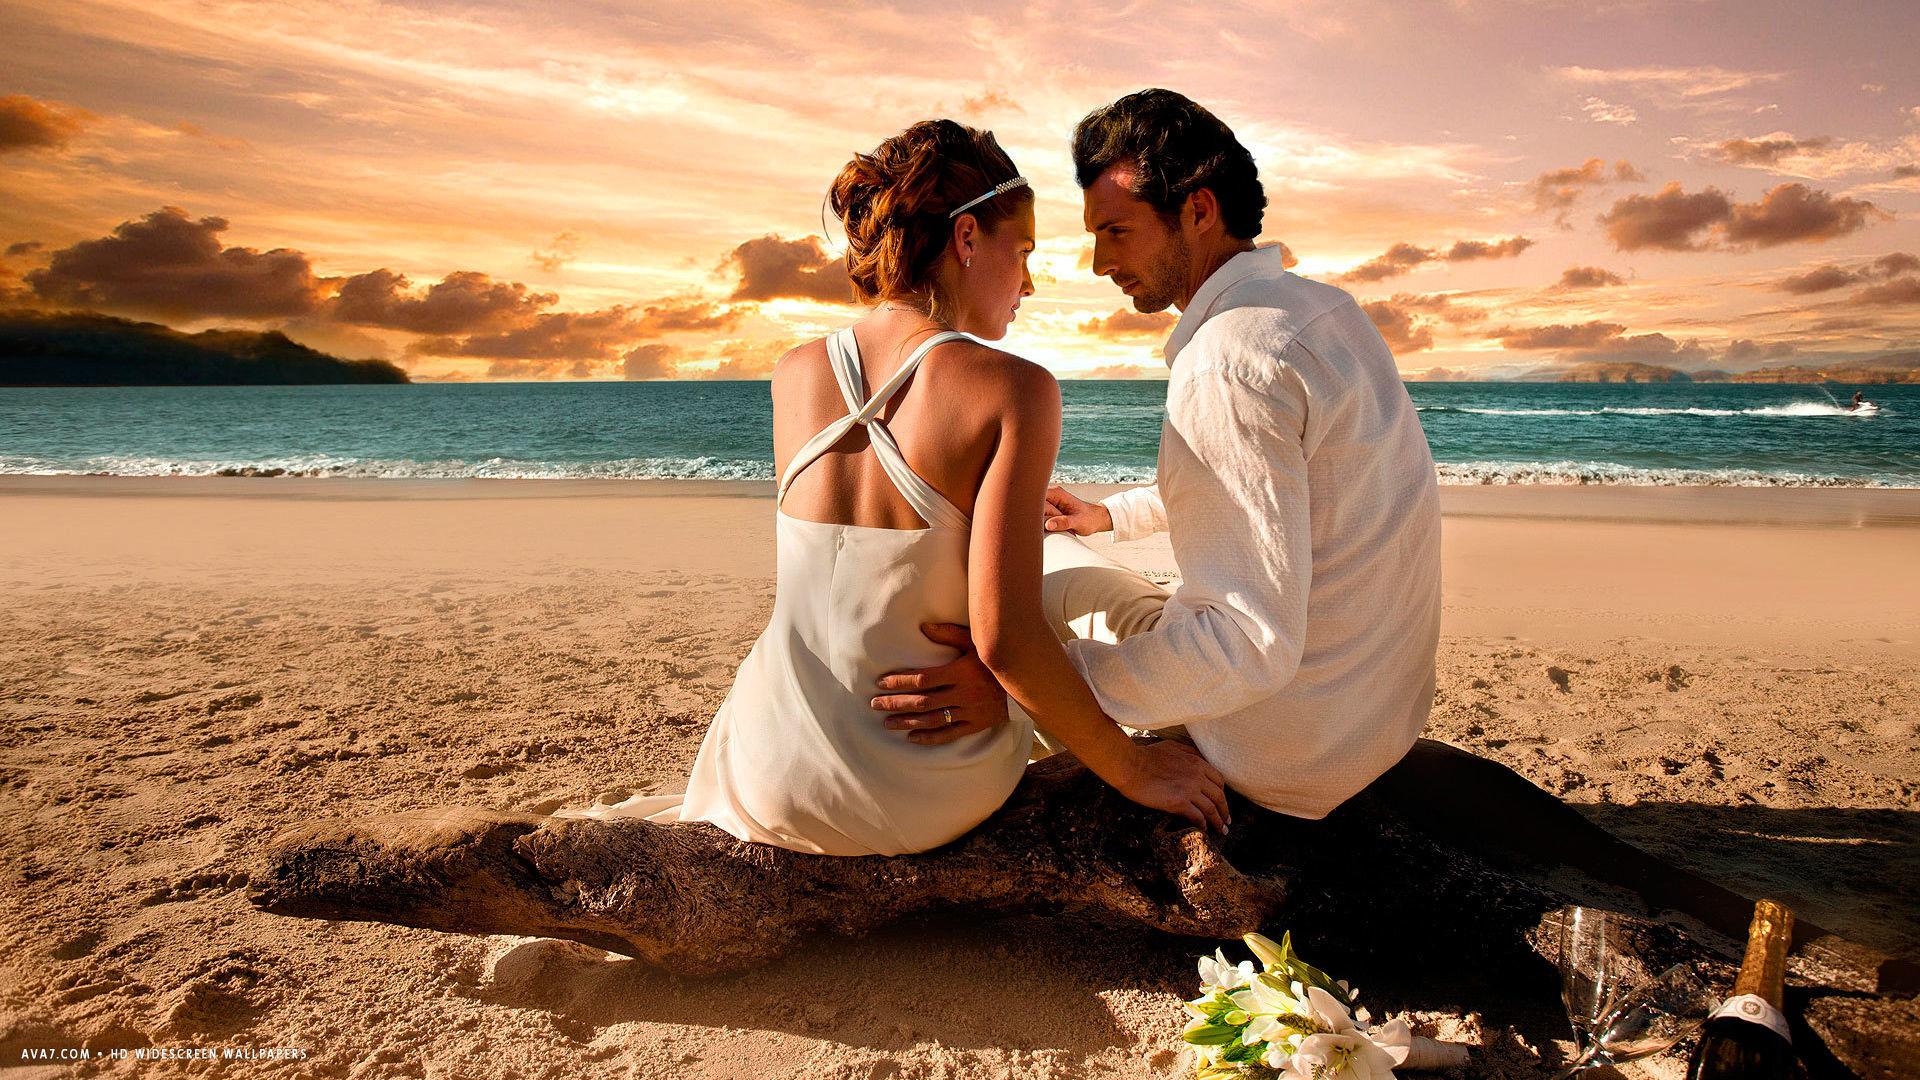 … loving couple love beach sunset sea feelings